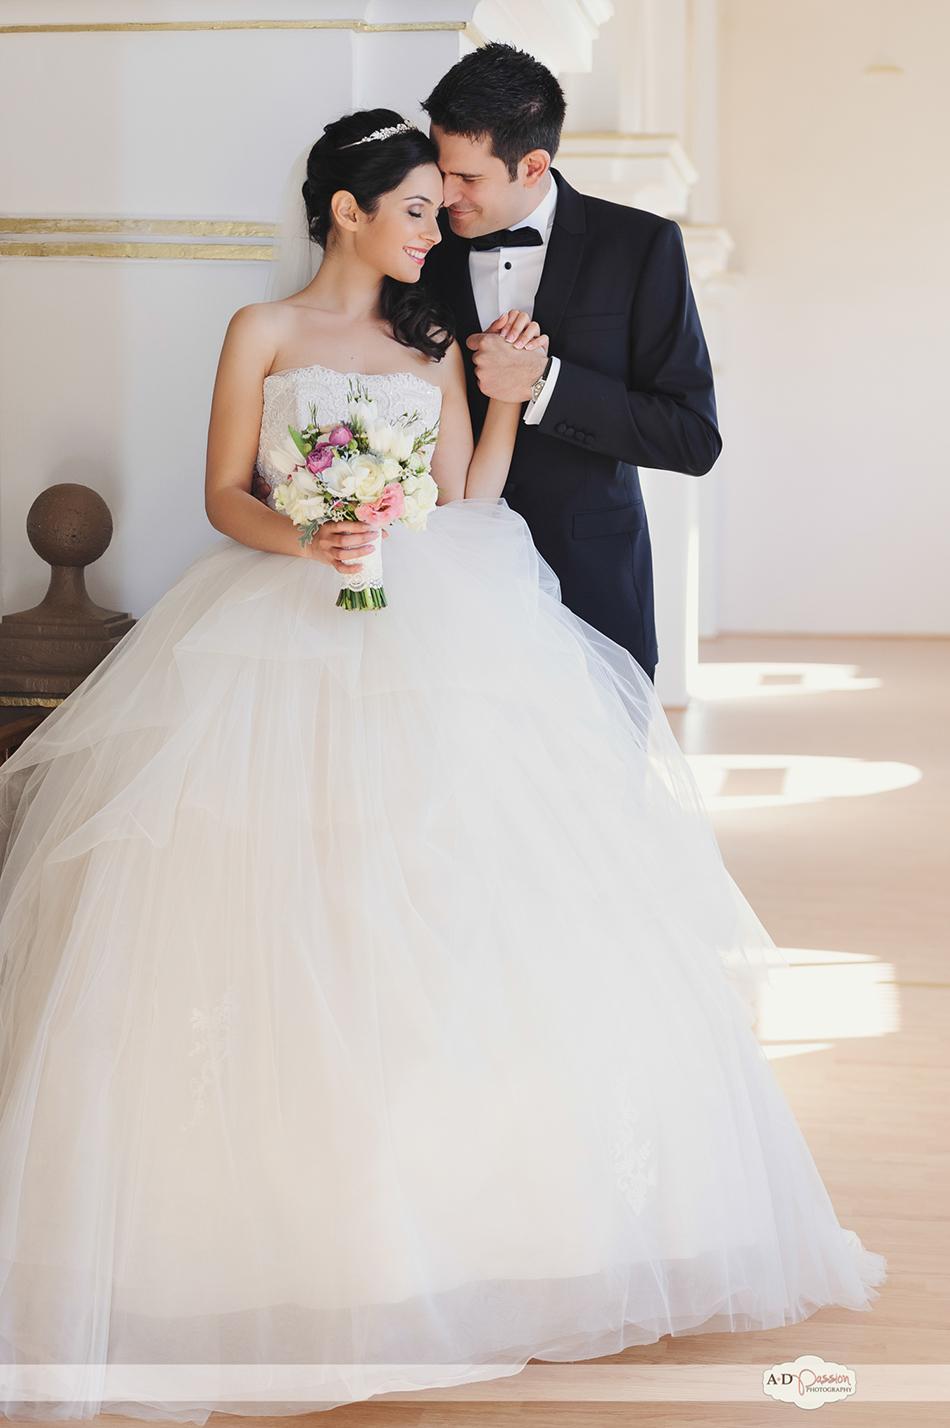 AD Passion Photography | fotograf-profesionist-de-nunta-arad-timisoara-bucuresti_madalina+mihnea_0066 | Adelin, Dida, fotograf profesionist, fotograf de nunta, fotografie de nunta, fotograf Timisoara, fotograf Craiova, fotograf Bucuresti, fotograf Arad, nunta Timisoara, nunta Arad, nunta Bucuresti, nunta Craiova